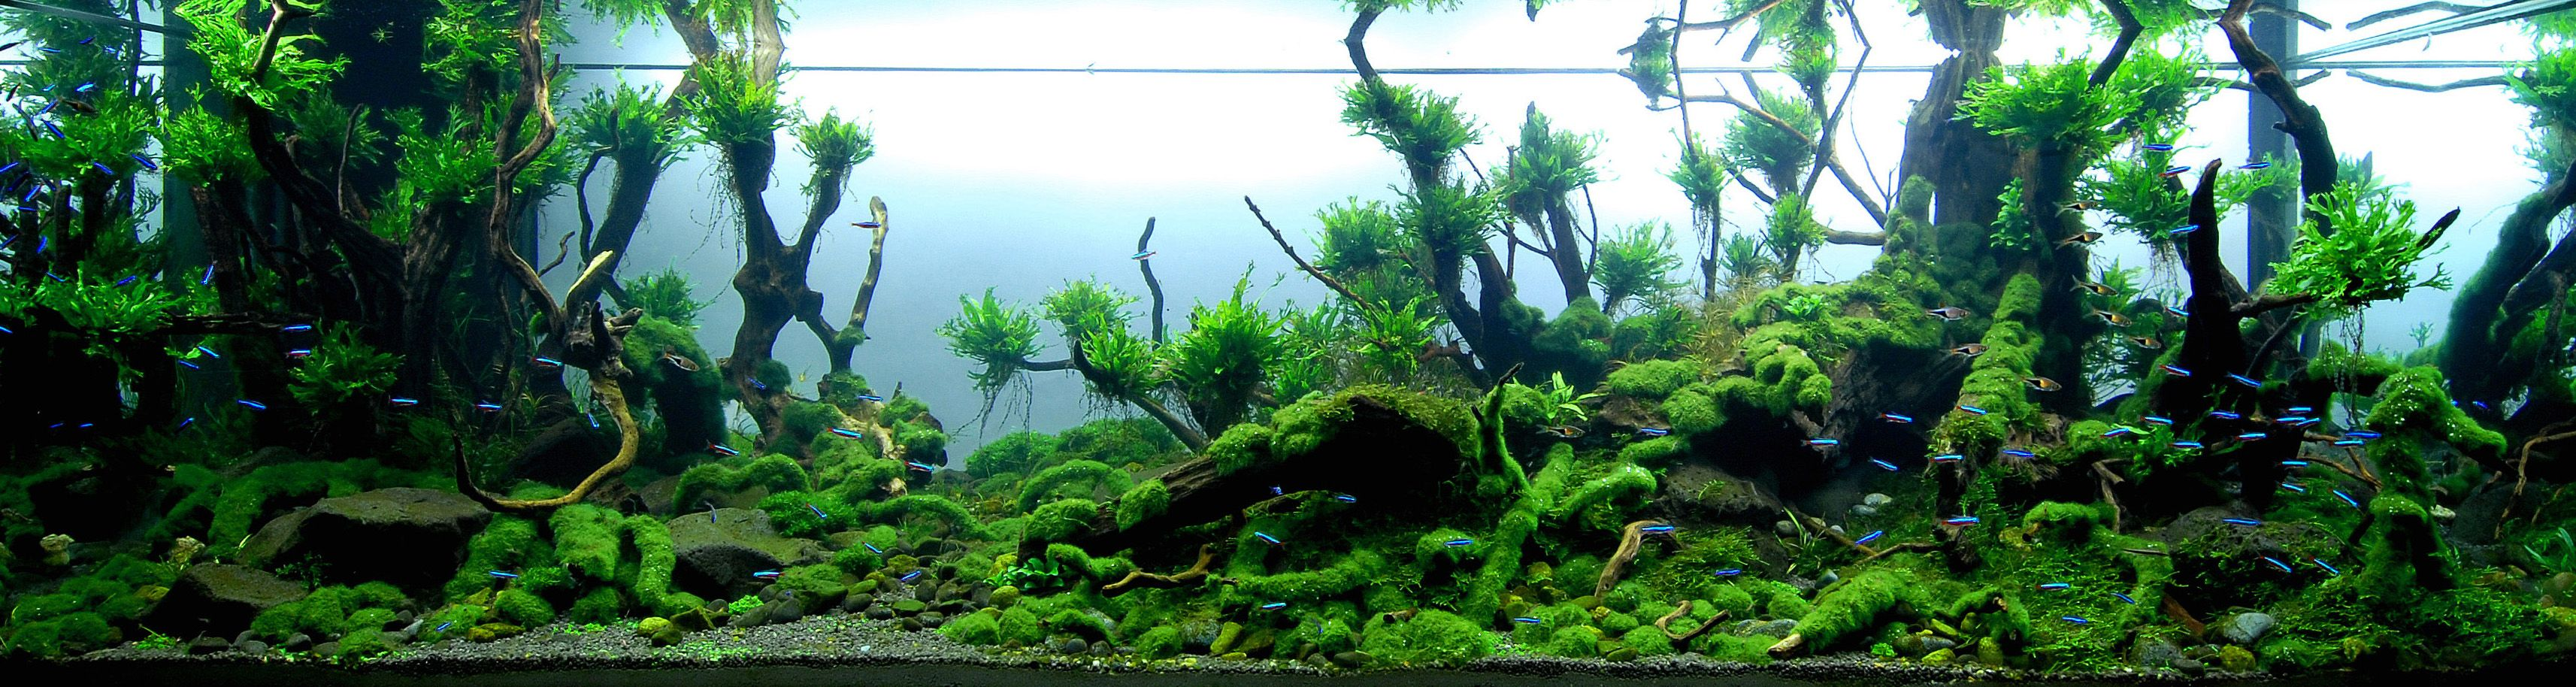 magical forest aquarium Google Search Aquariums